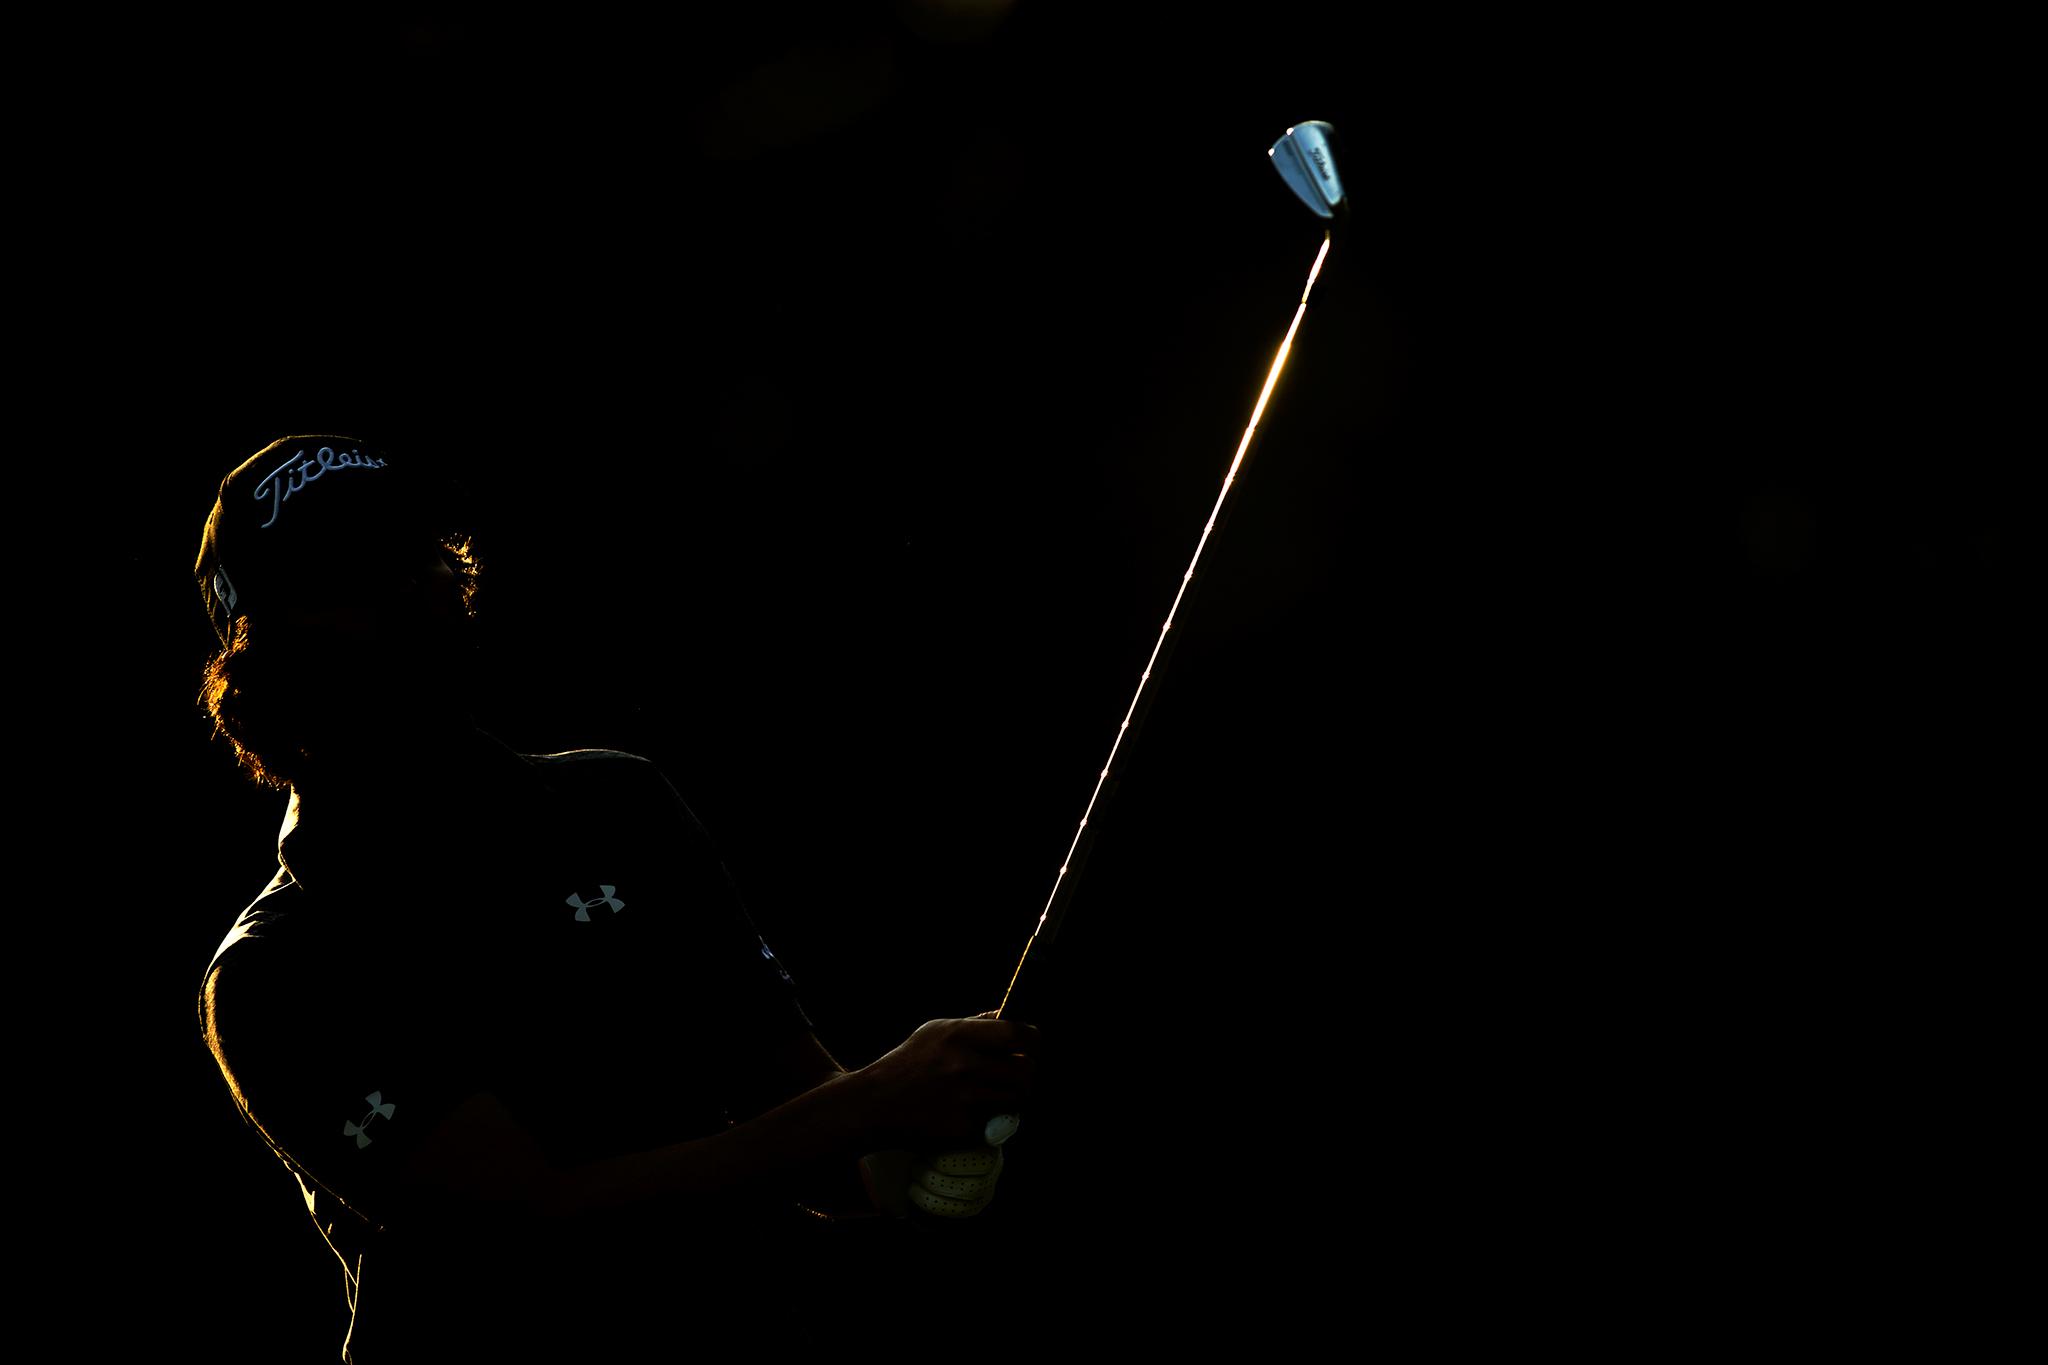 Martin Flores, 2015 Wyndham Championship. .  Sedgefield Country Club,Greensboro, North Carolina. Canon 1DX, Canon EF 400mm f2.8L II